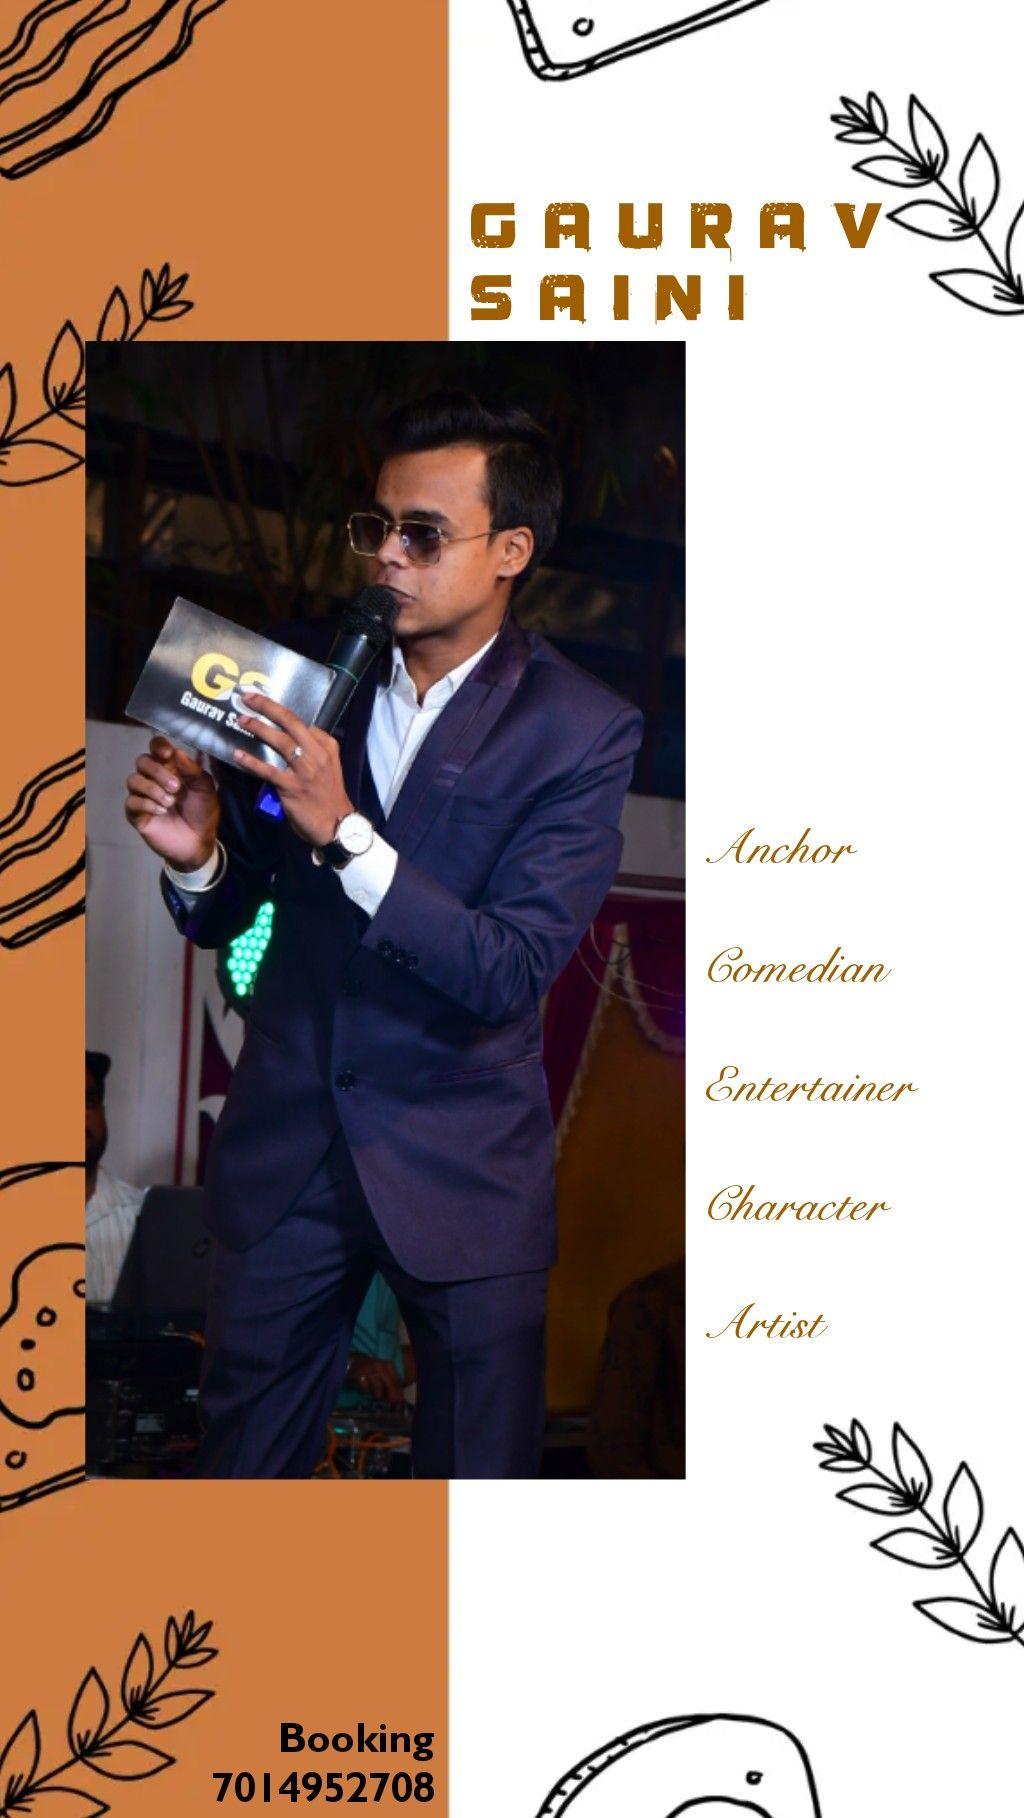 #anchorgaurav #emceegaurav #anchor #emcee #entertainer #comedian #characterartist #gauravsaini #ag #anchorgauravsaini #showposter #anchorinrajasthan #bestanchor #bestmaleanchor #theatreartist